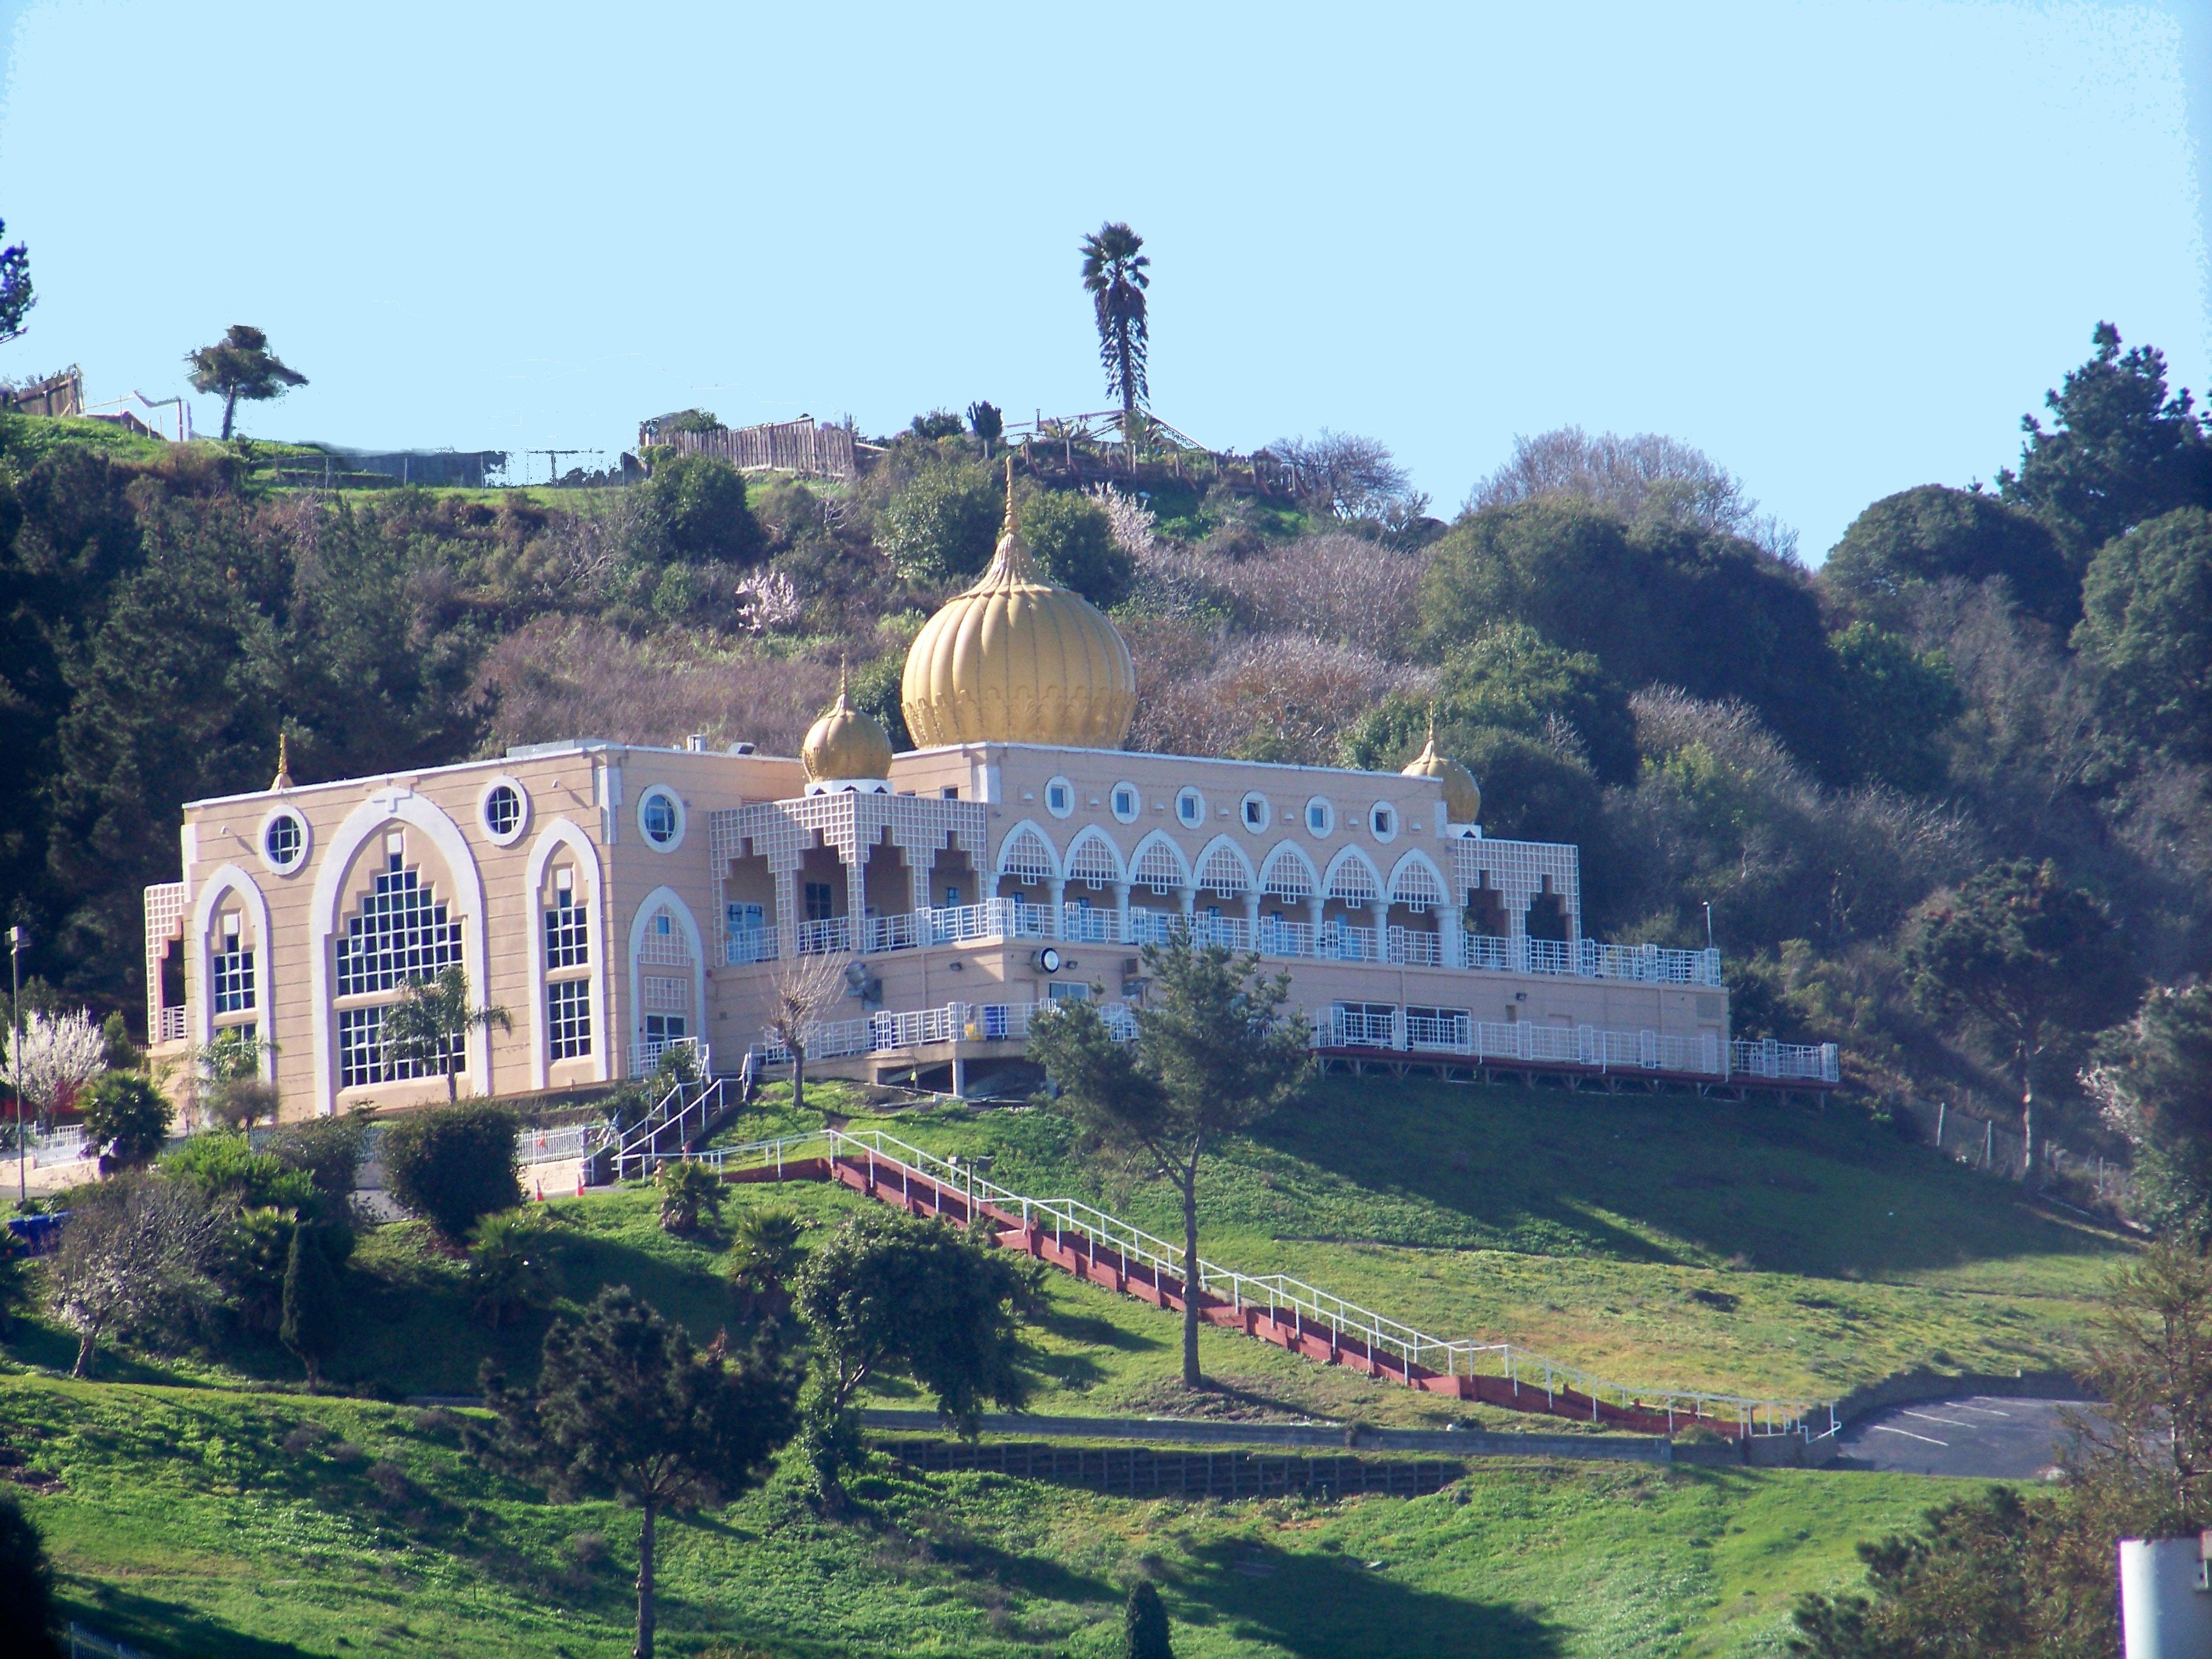 The Sikh Center of San Francisco Bay Area, El Sobrante, California (source: Wikipedia)